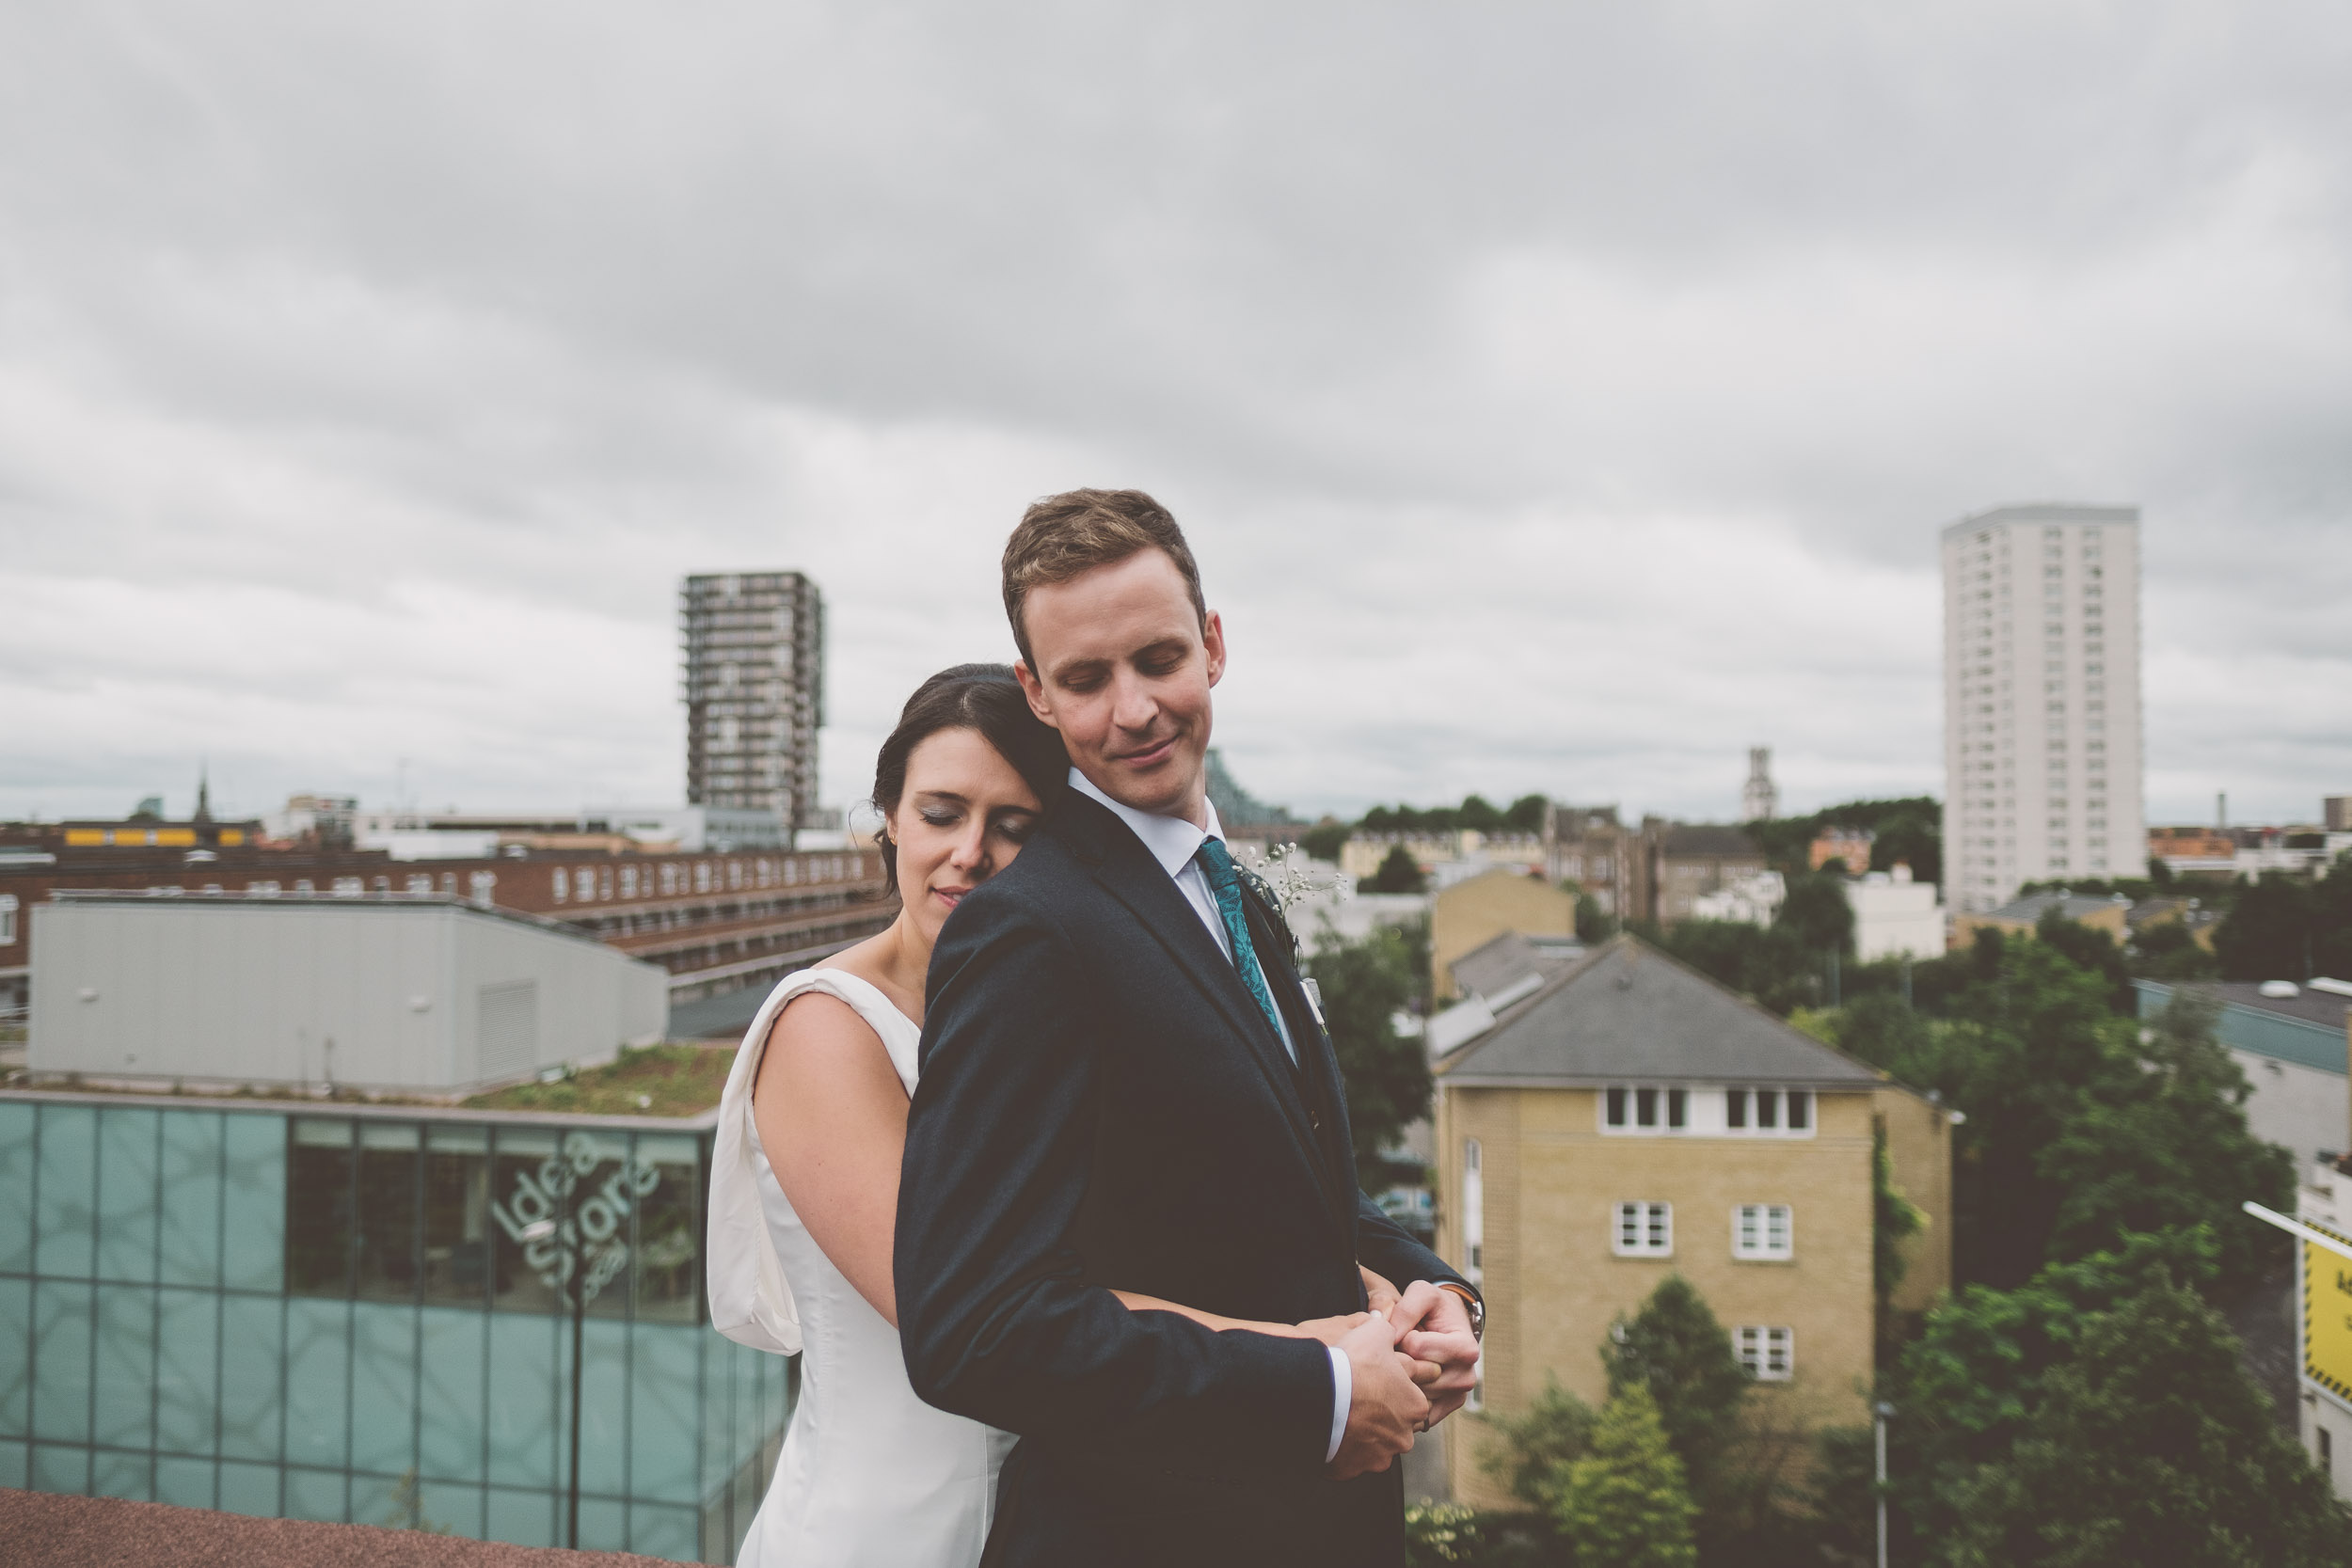 islington-town-hall-4th-floor-studios-wedding291.jpg